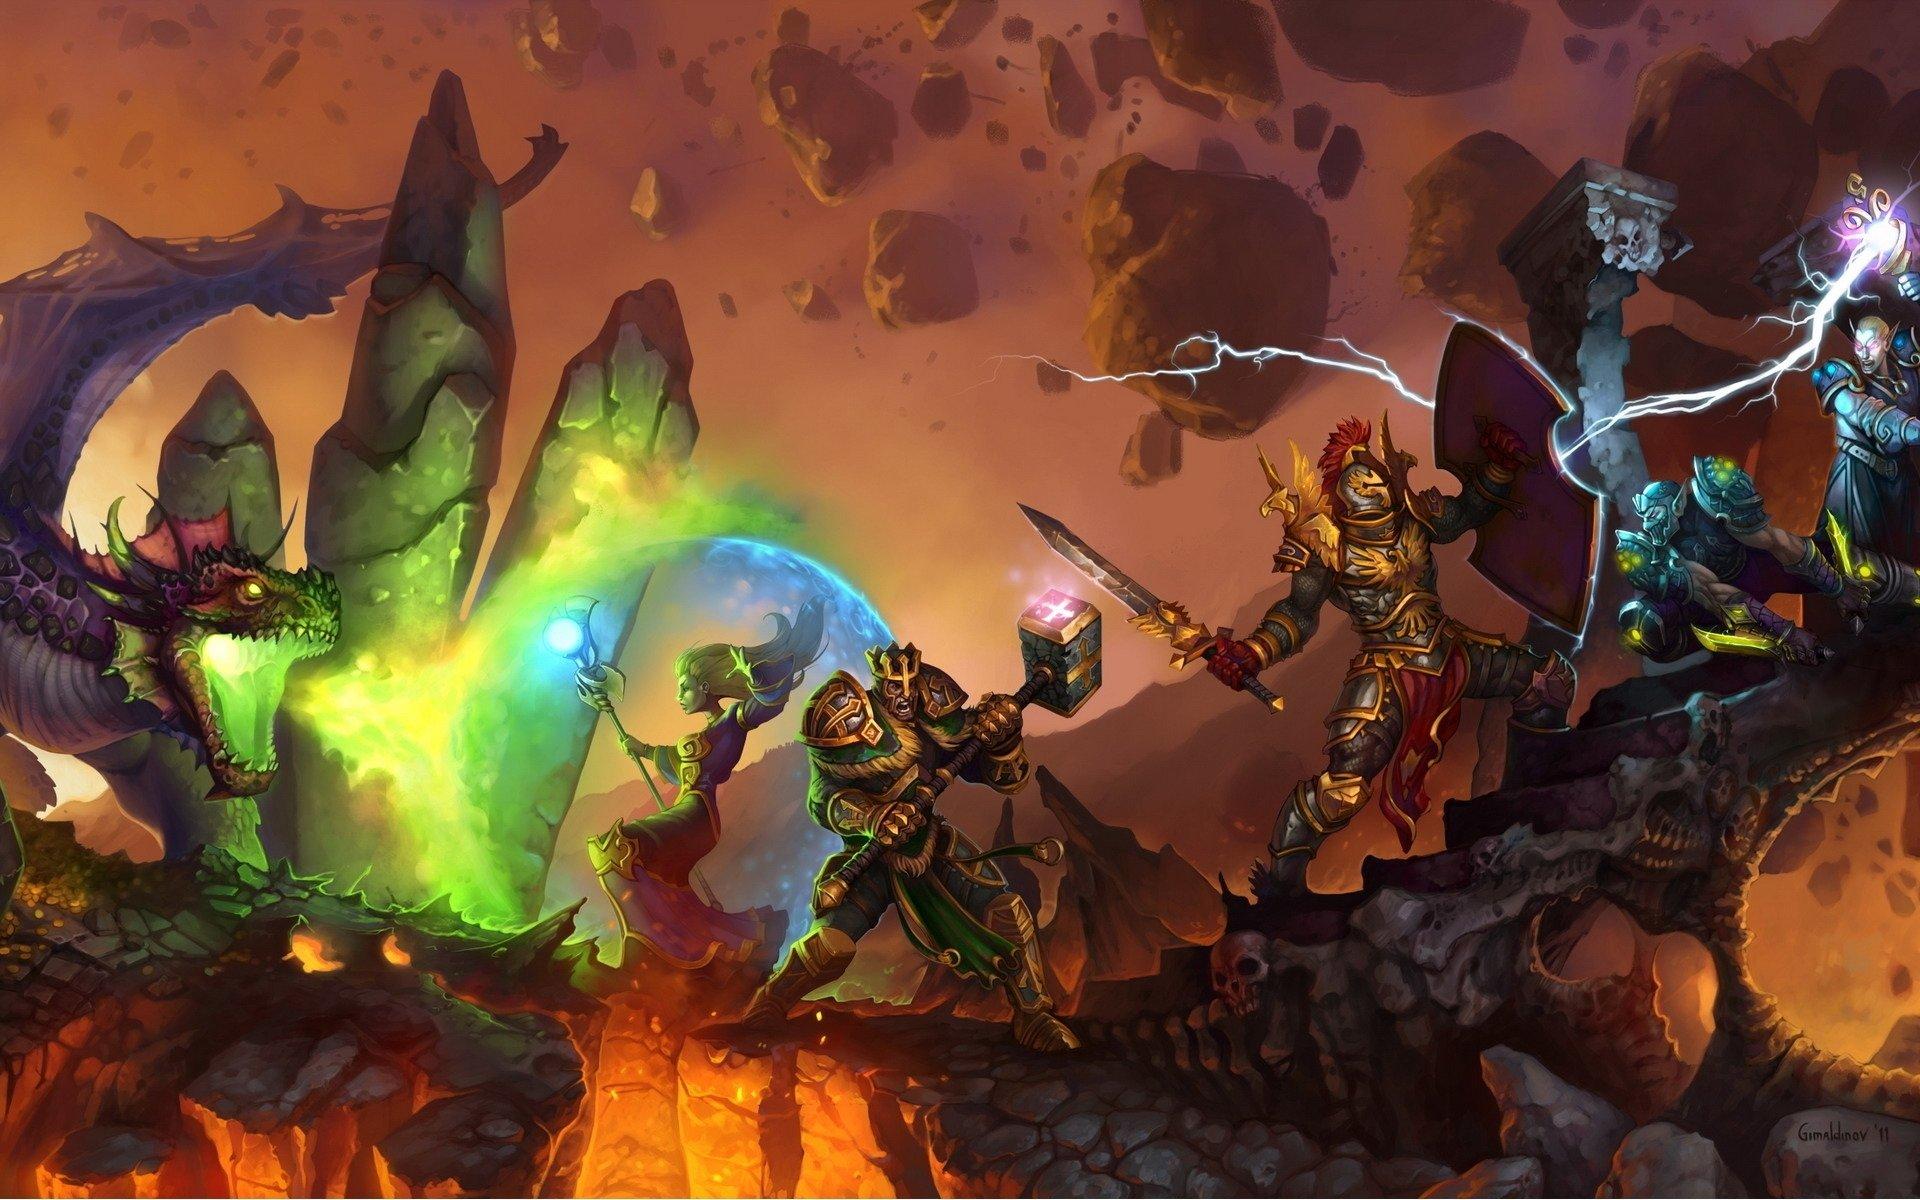 wizard battle wallpaper - photo #8